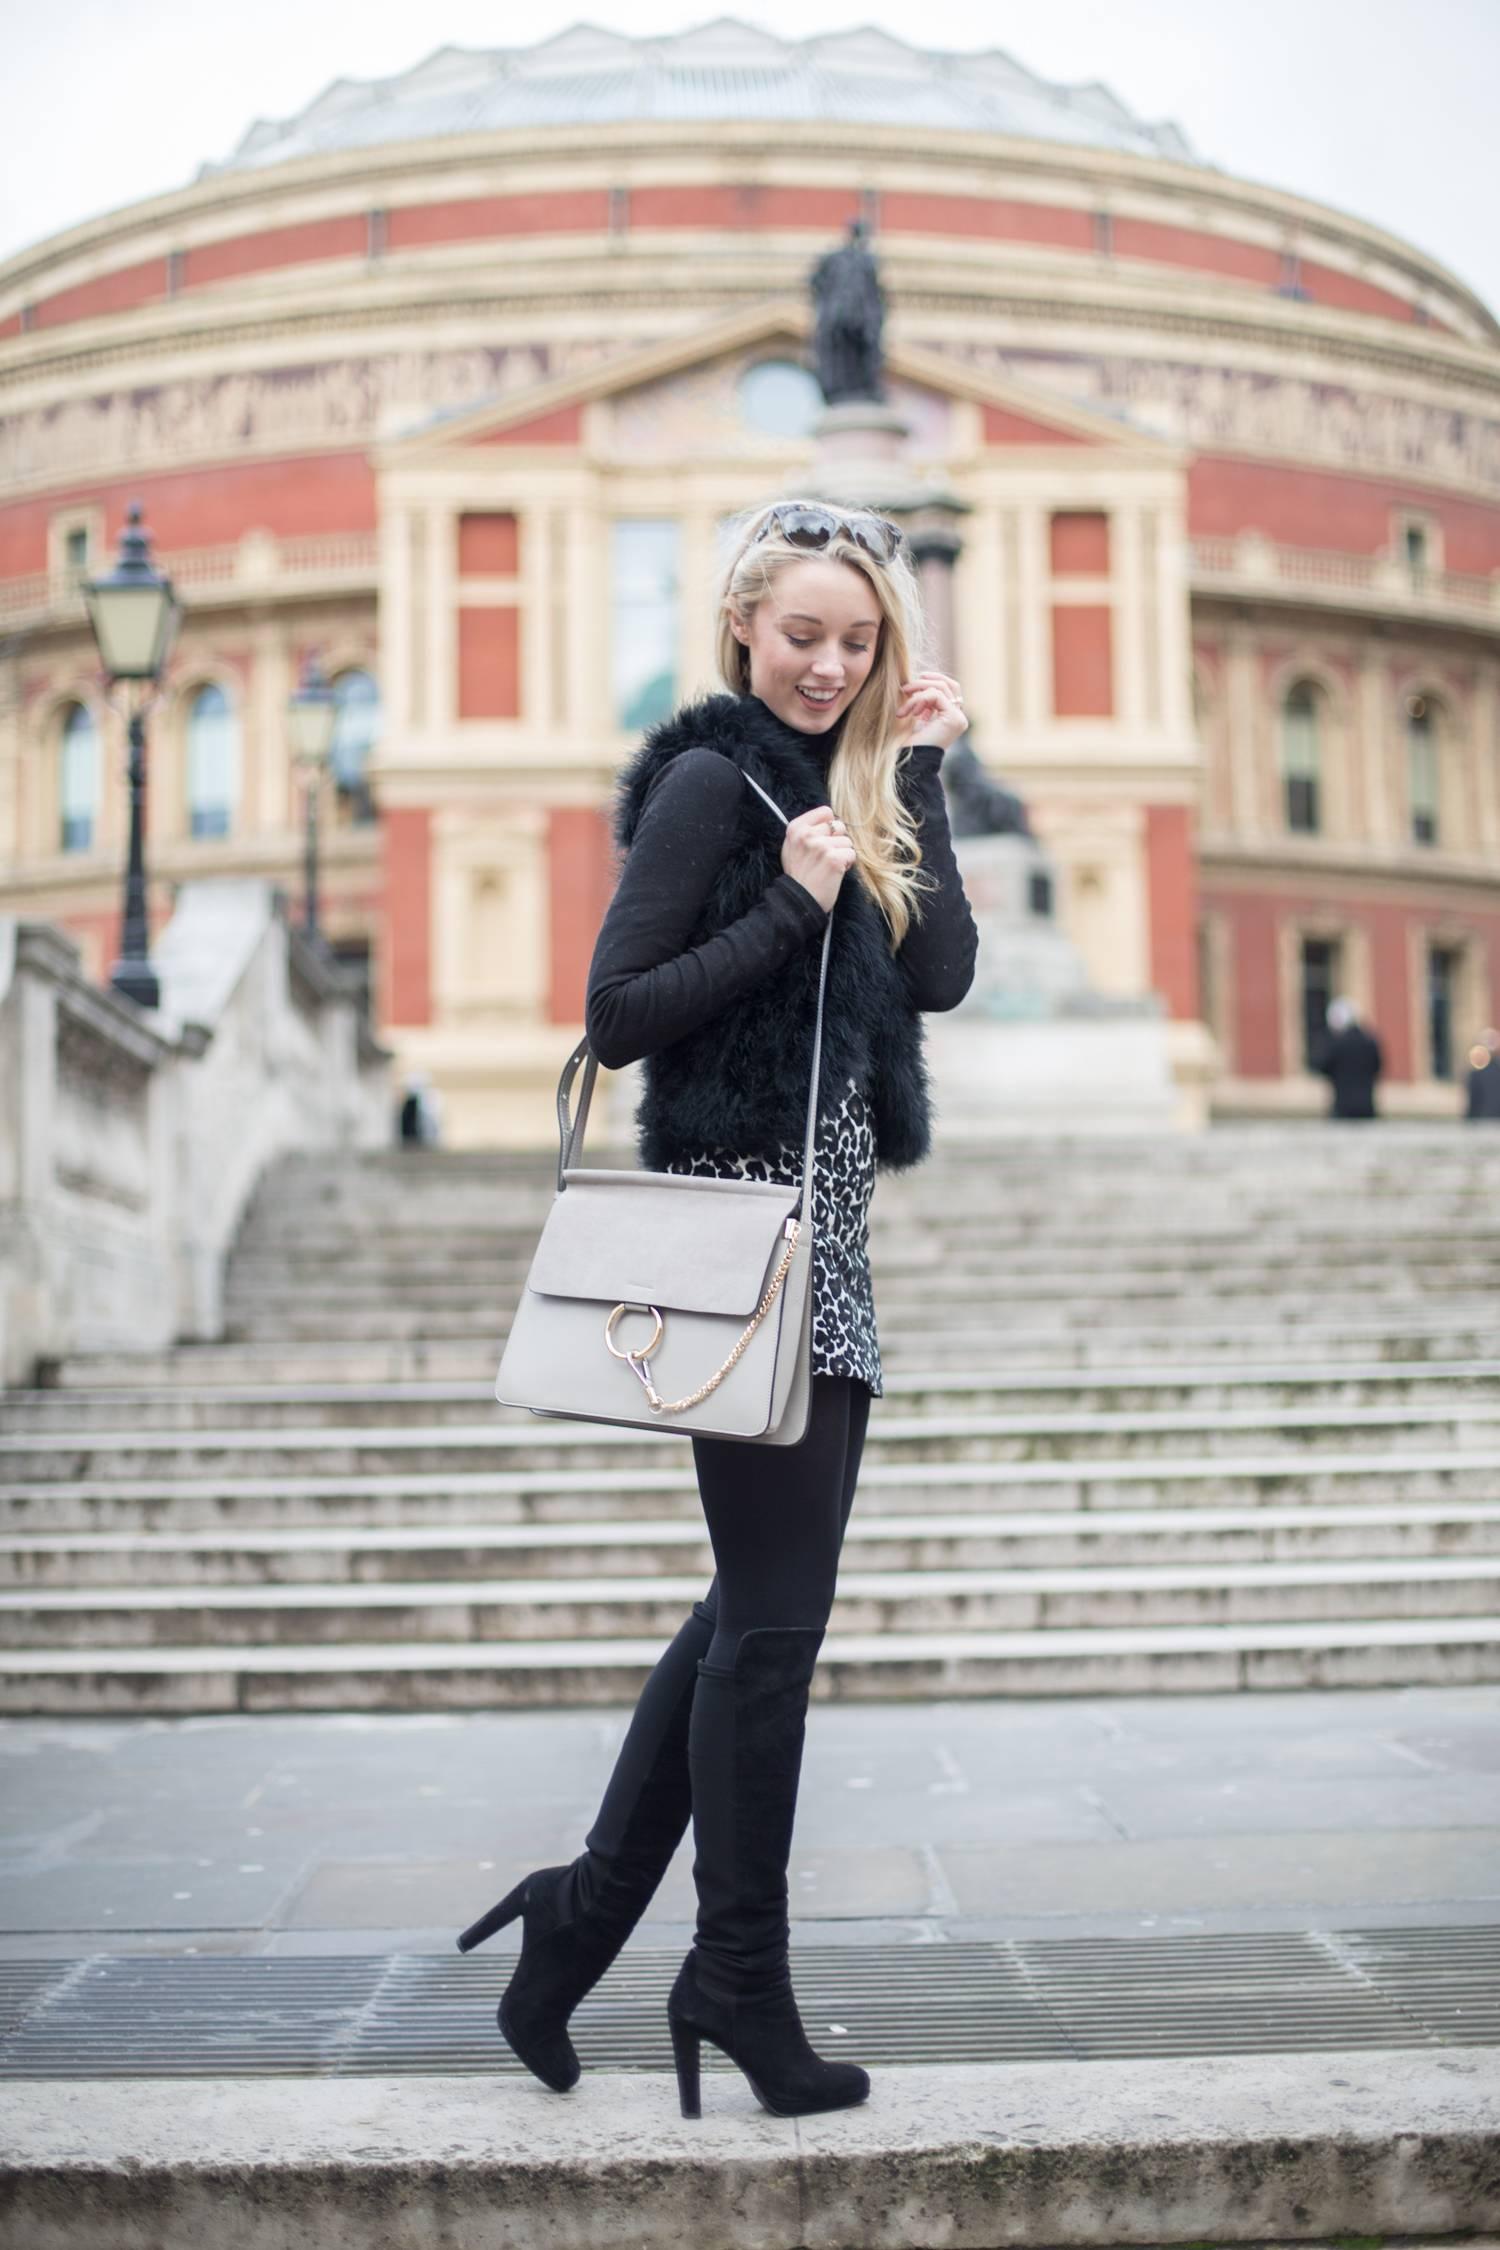 white chloe handbag - Handbags : Dupes Vs Investments! - Fashion Mumblr